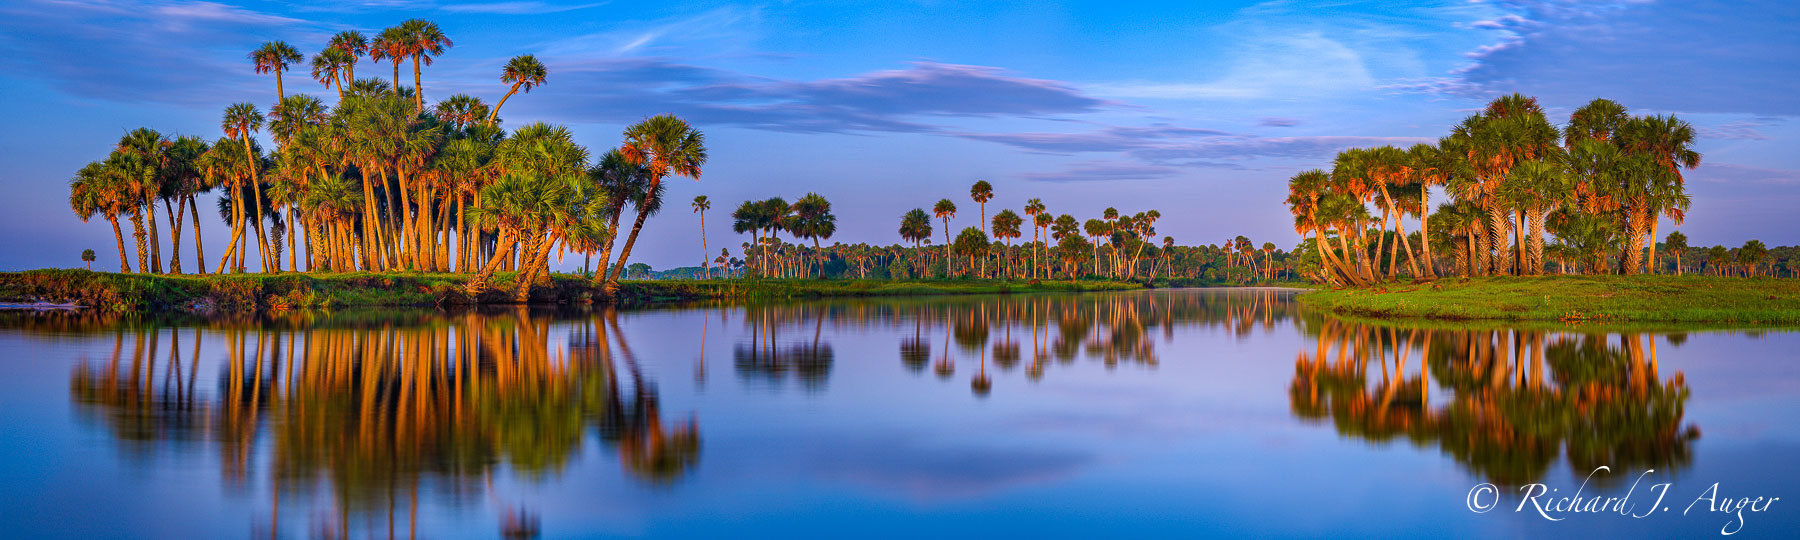 St Johns River, Florida, Orlando, Big Econlockhatchee, Econ, Palm Trees, Purple, Orange, reflections, morning